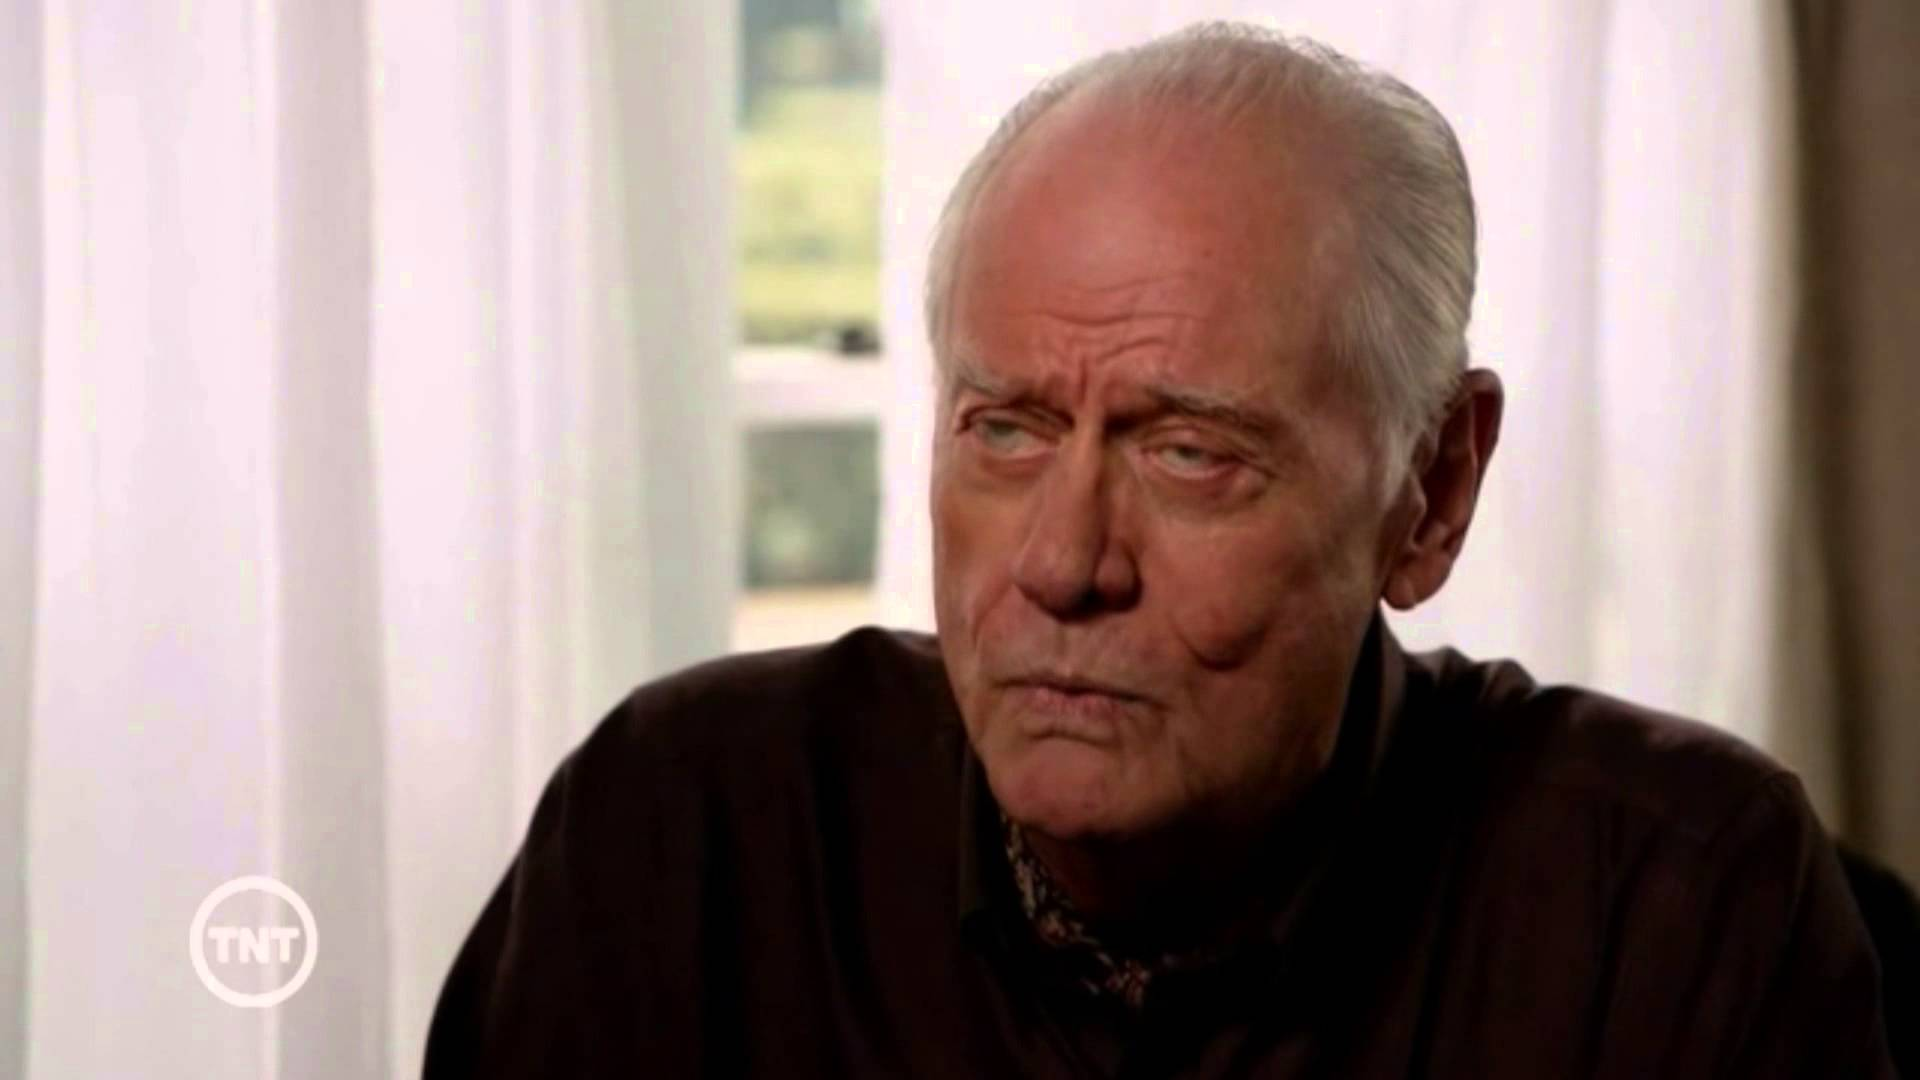 Dallas: Larry Hagman as JR Ewing Quotes Part 7